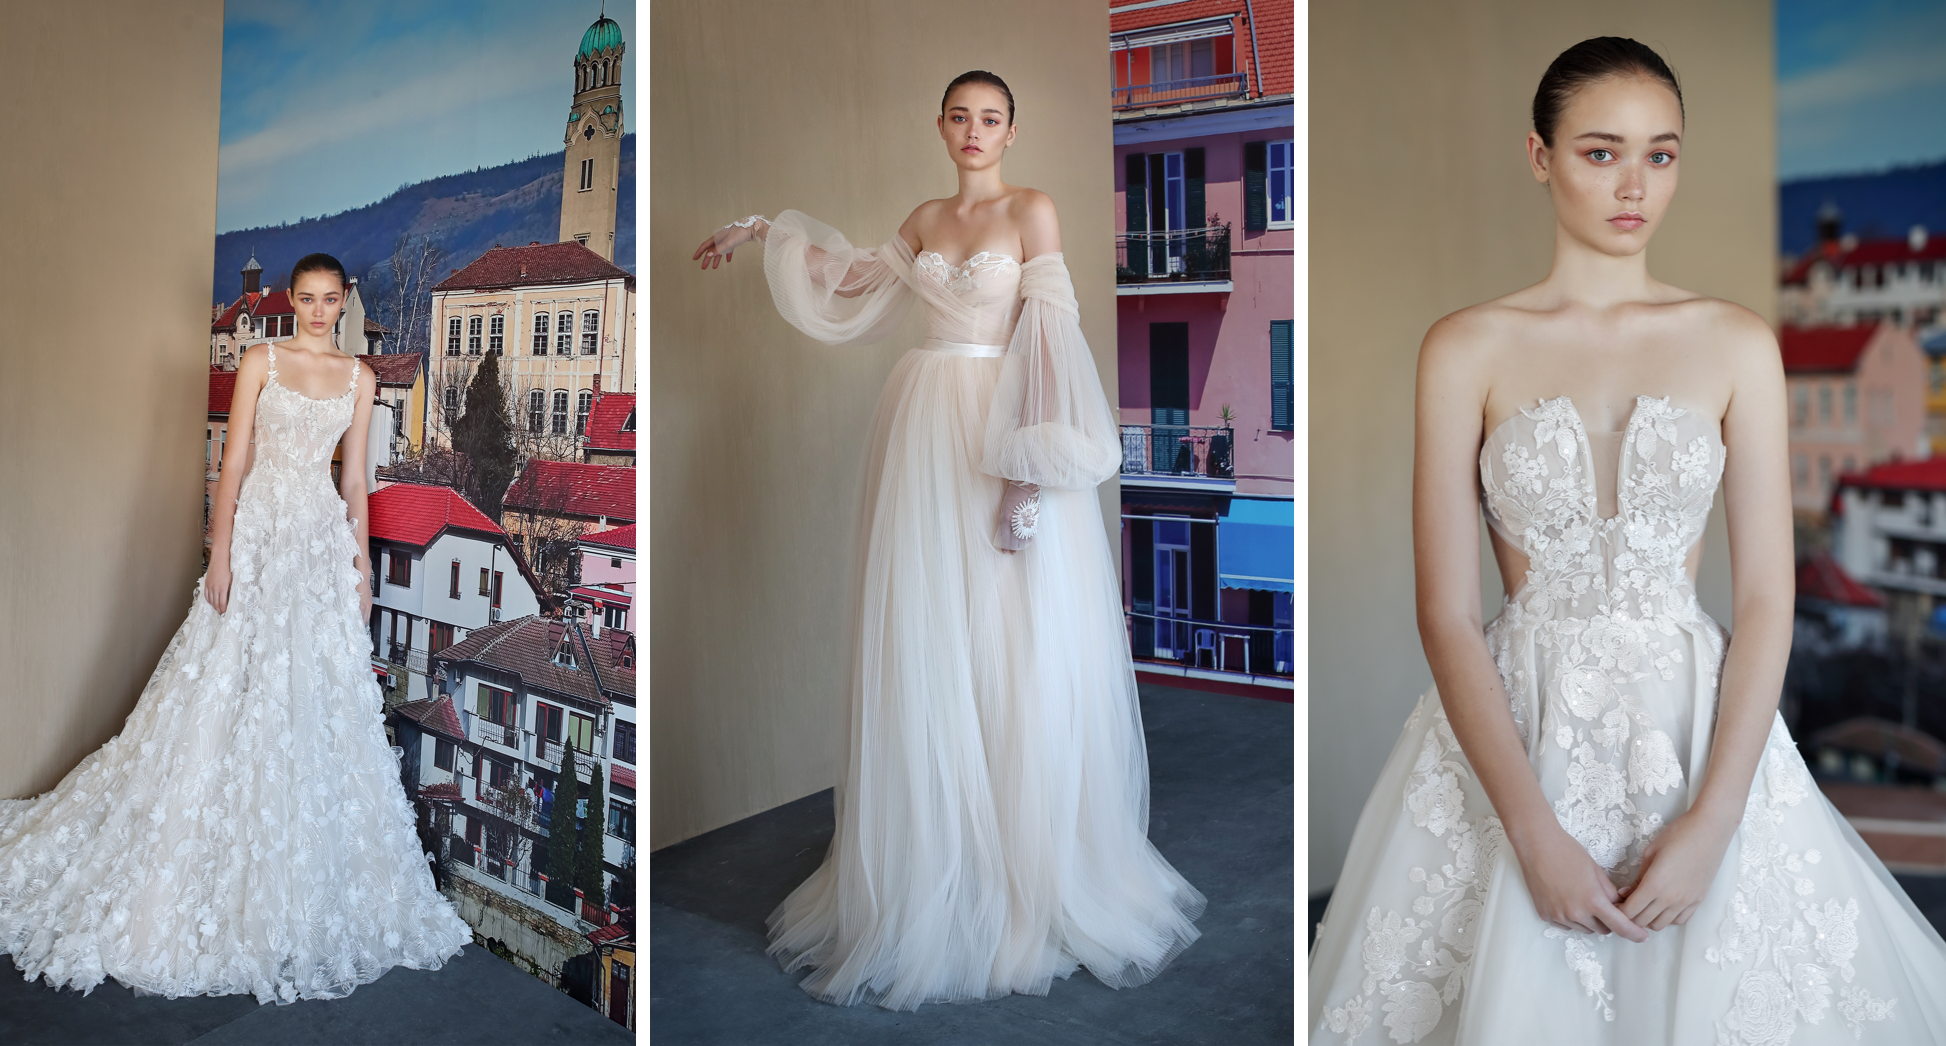 Jewish Wedding Designers Reimagine Traditional Gown The Forward